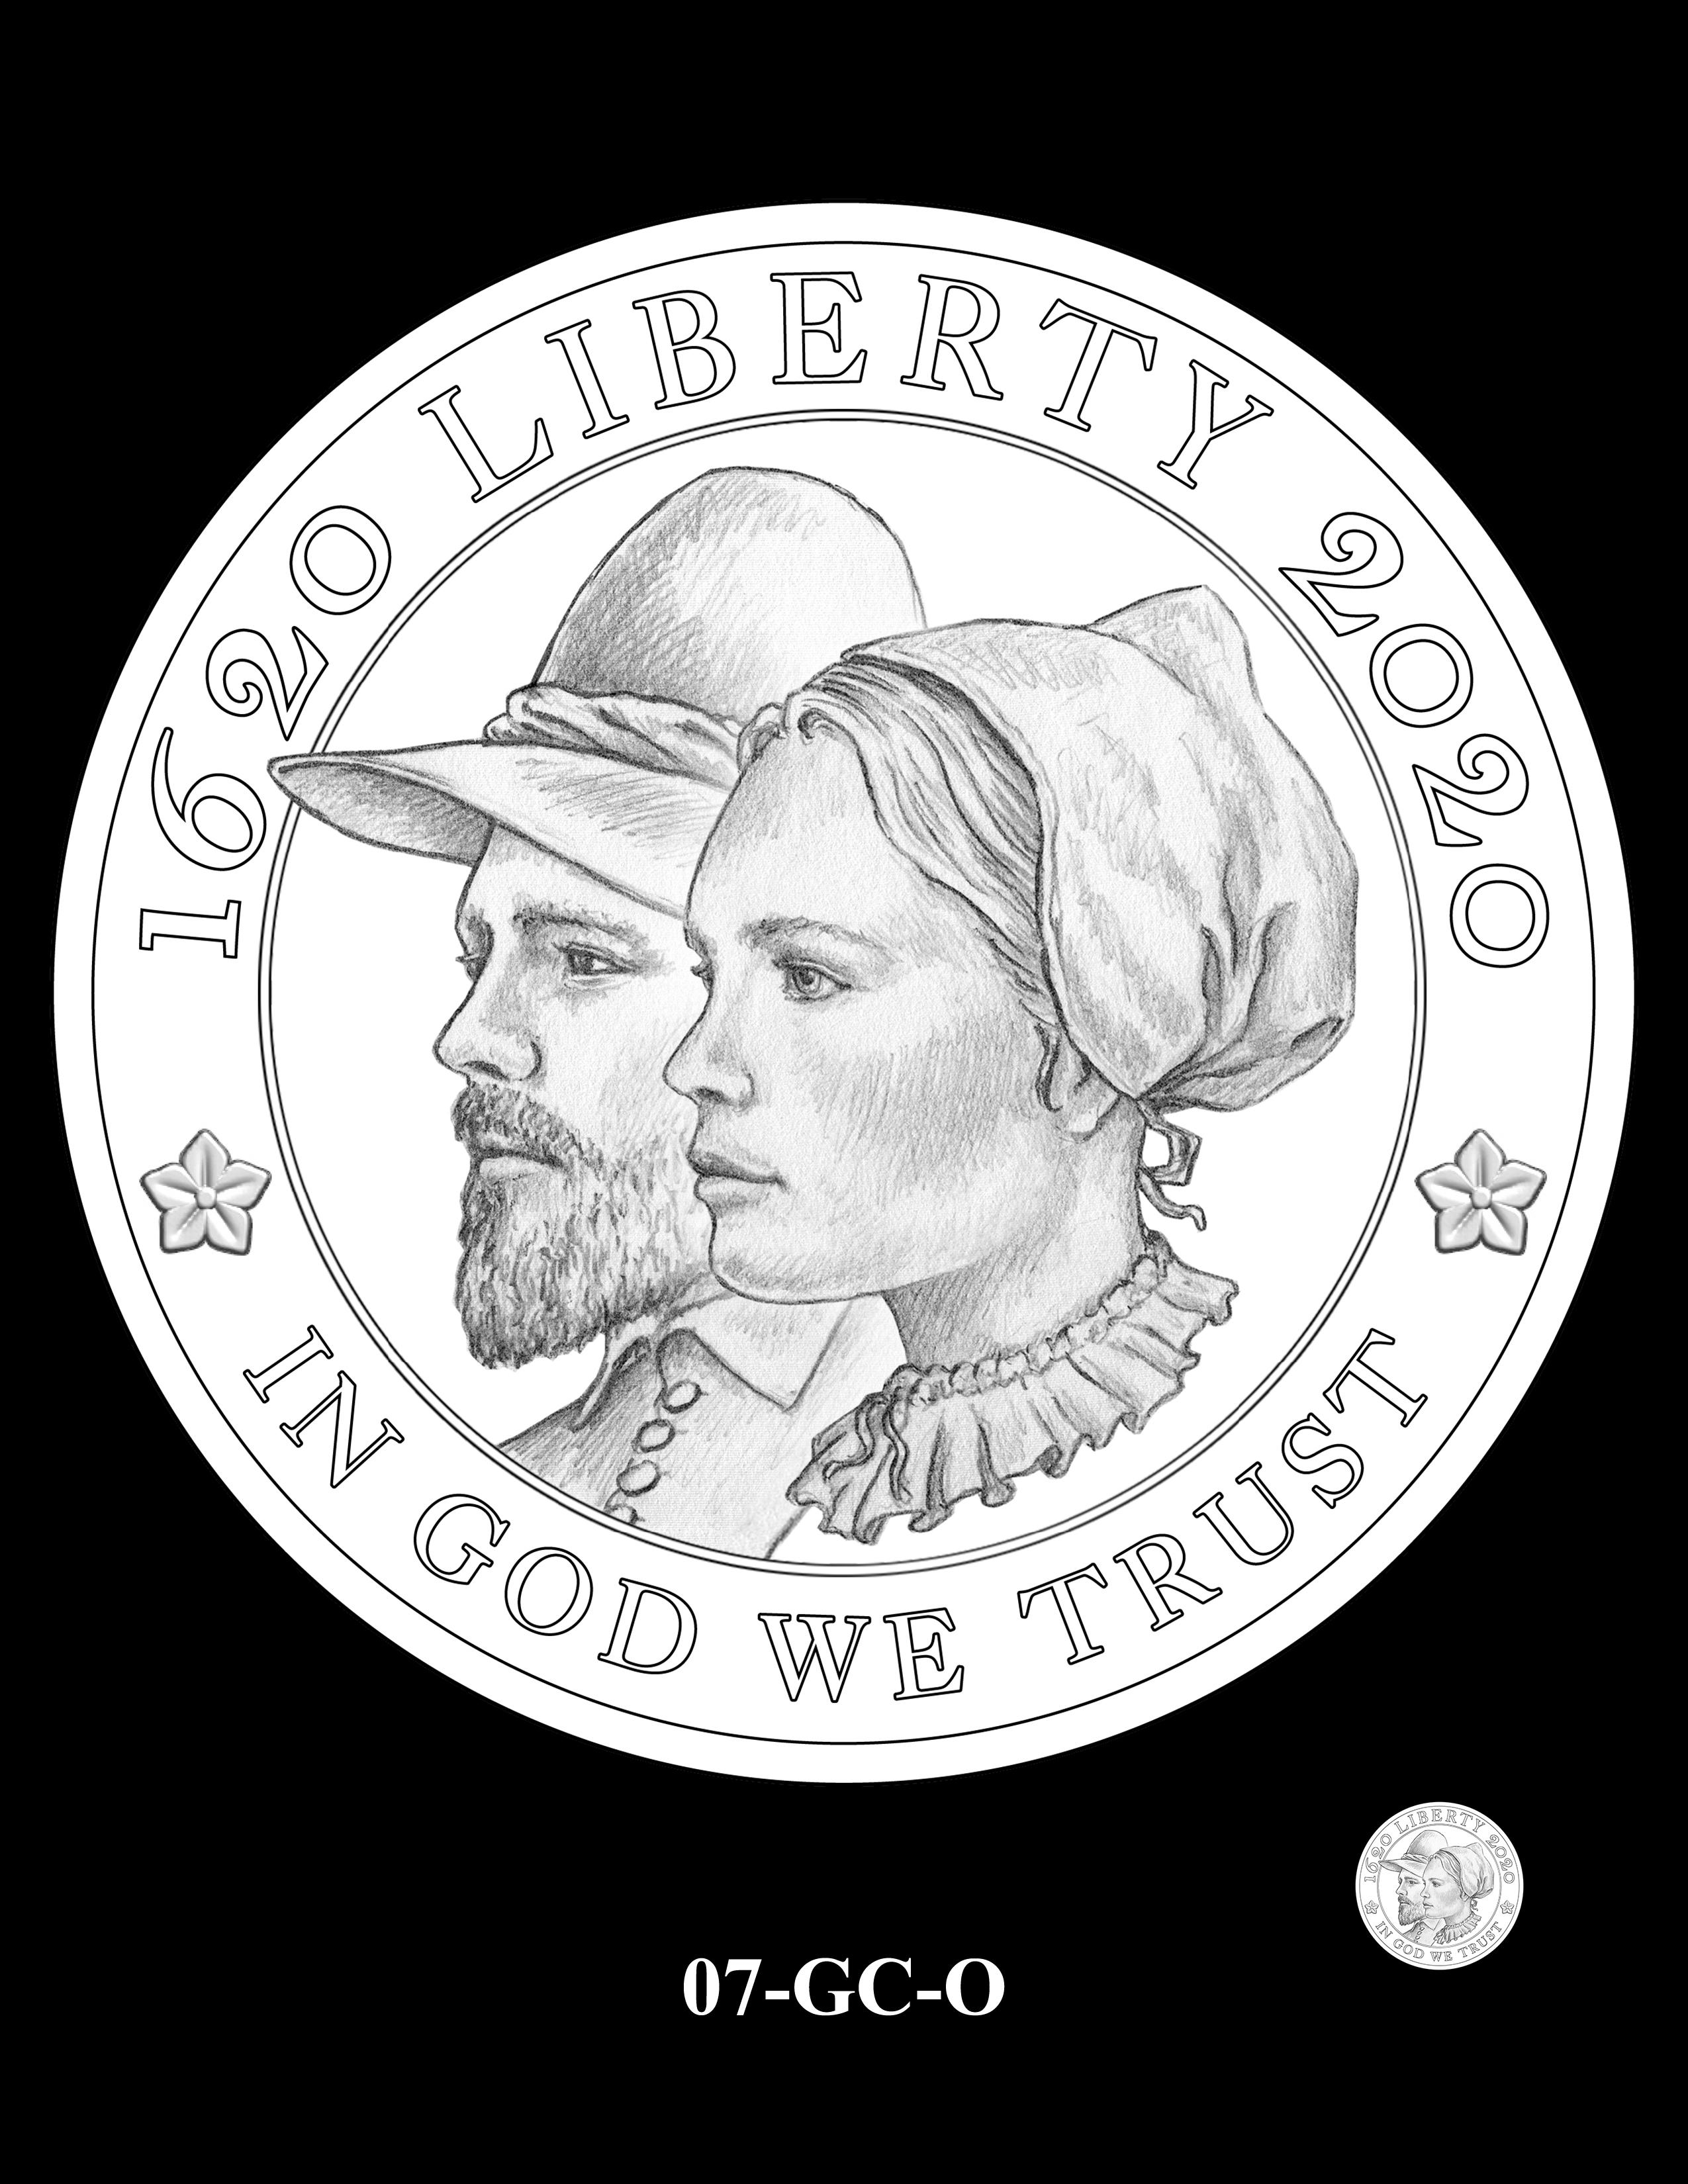 07-GC-O - 2020 Mayflower 400th Anniversary 24K Gold Coin & Silver Medal Program